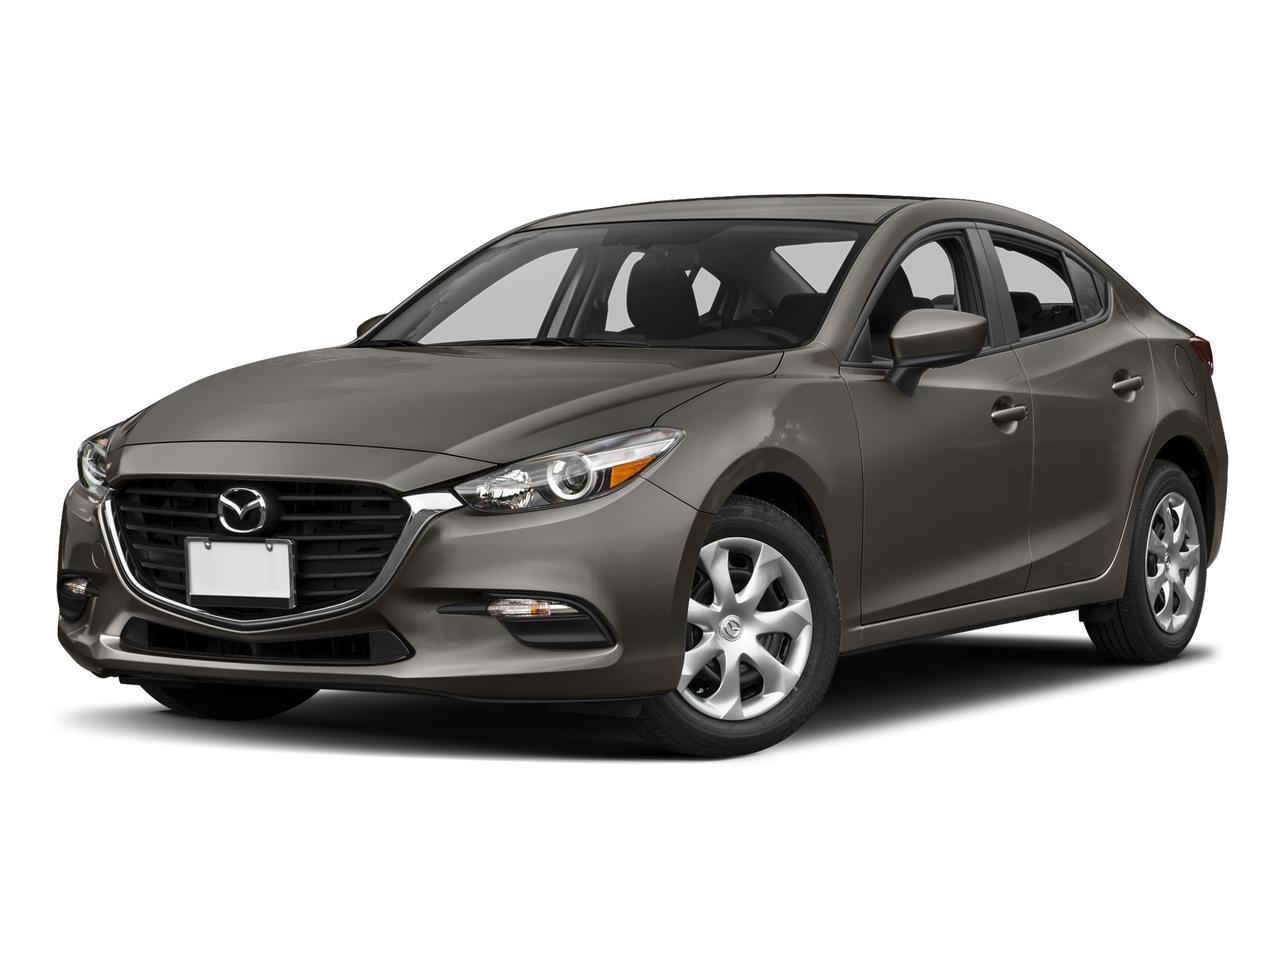 2017 Mazda Mazda3 4-Door Vehicle Photo in Mission, TX 78572